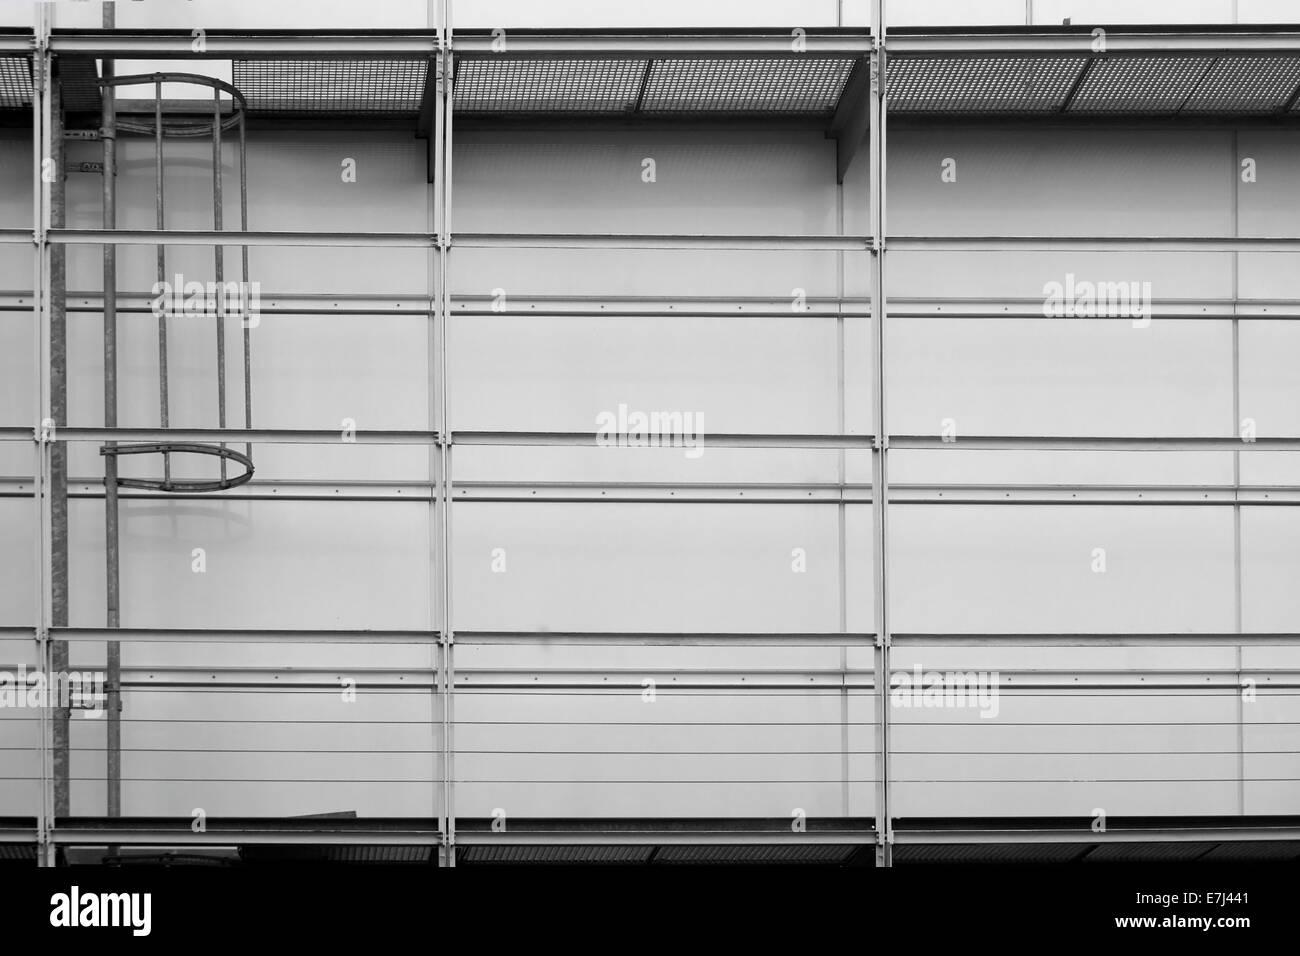 Scaffolding and fire escape - Stock Image